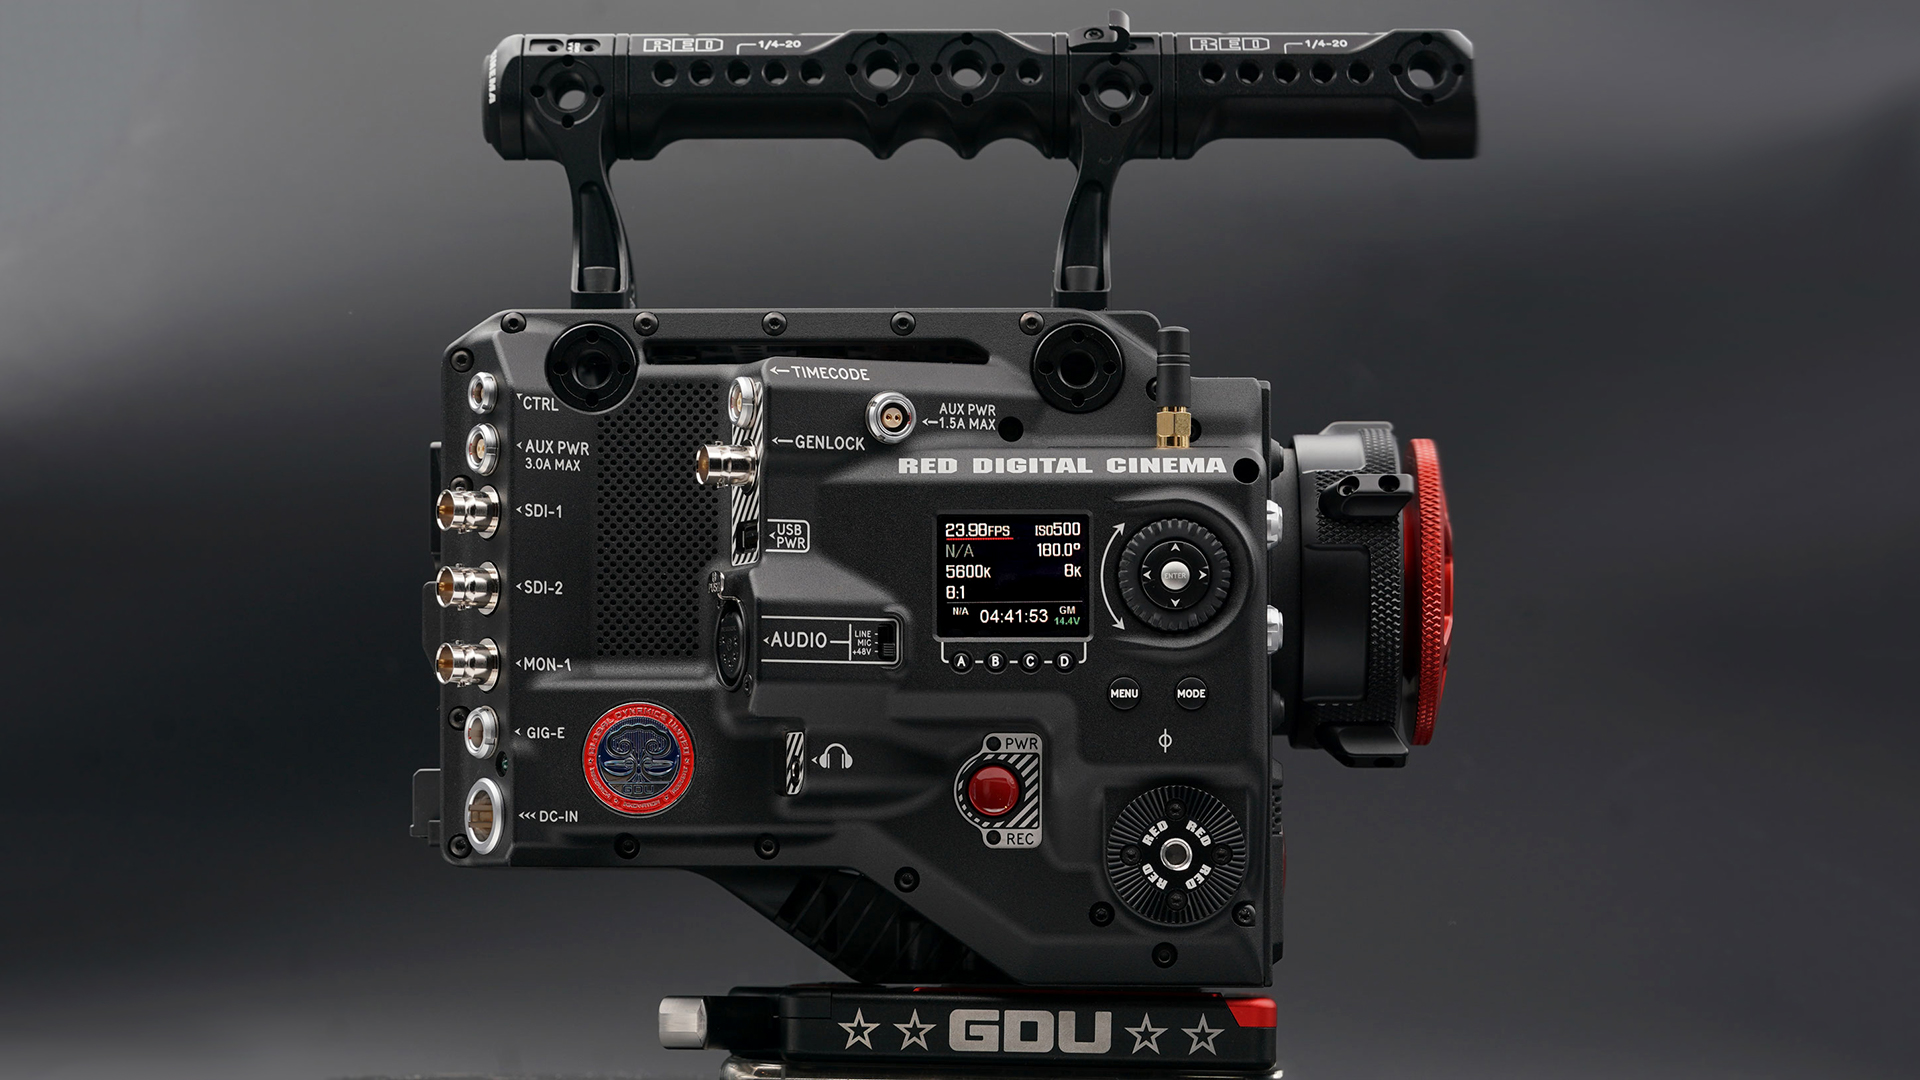 REDがRangerを発表 - レンタル専用のハイエンドカメラ